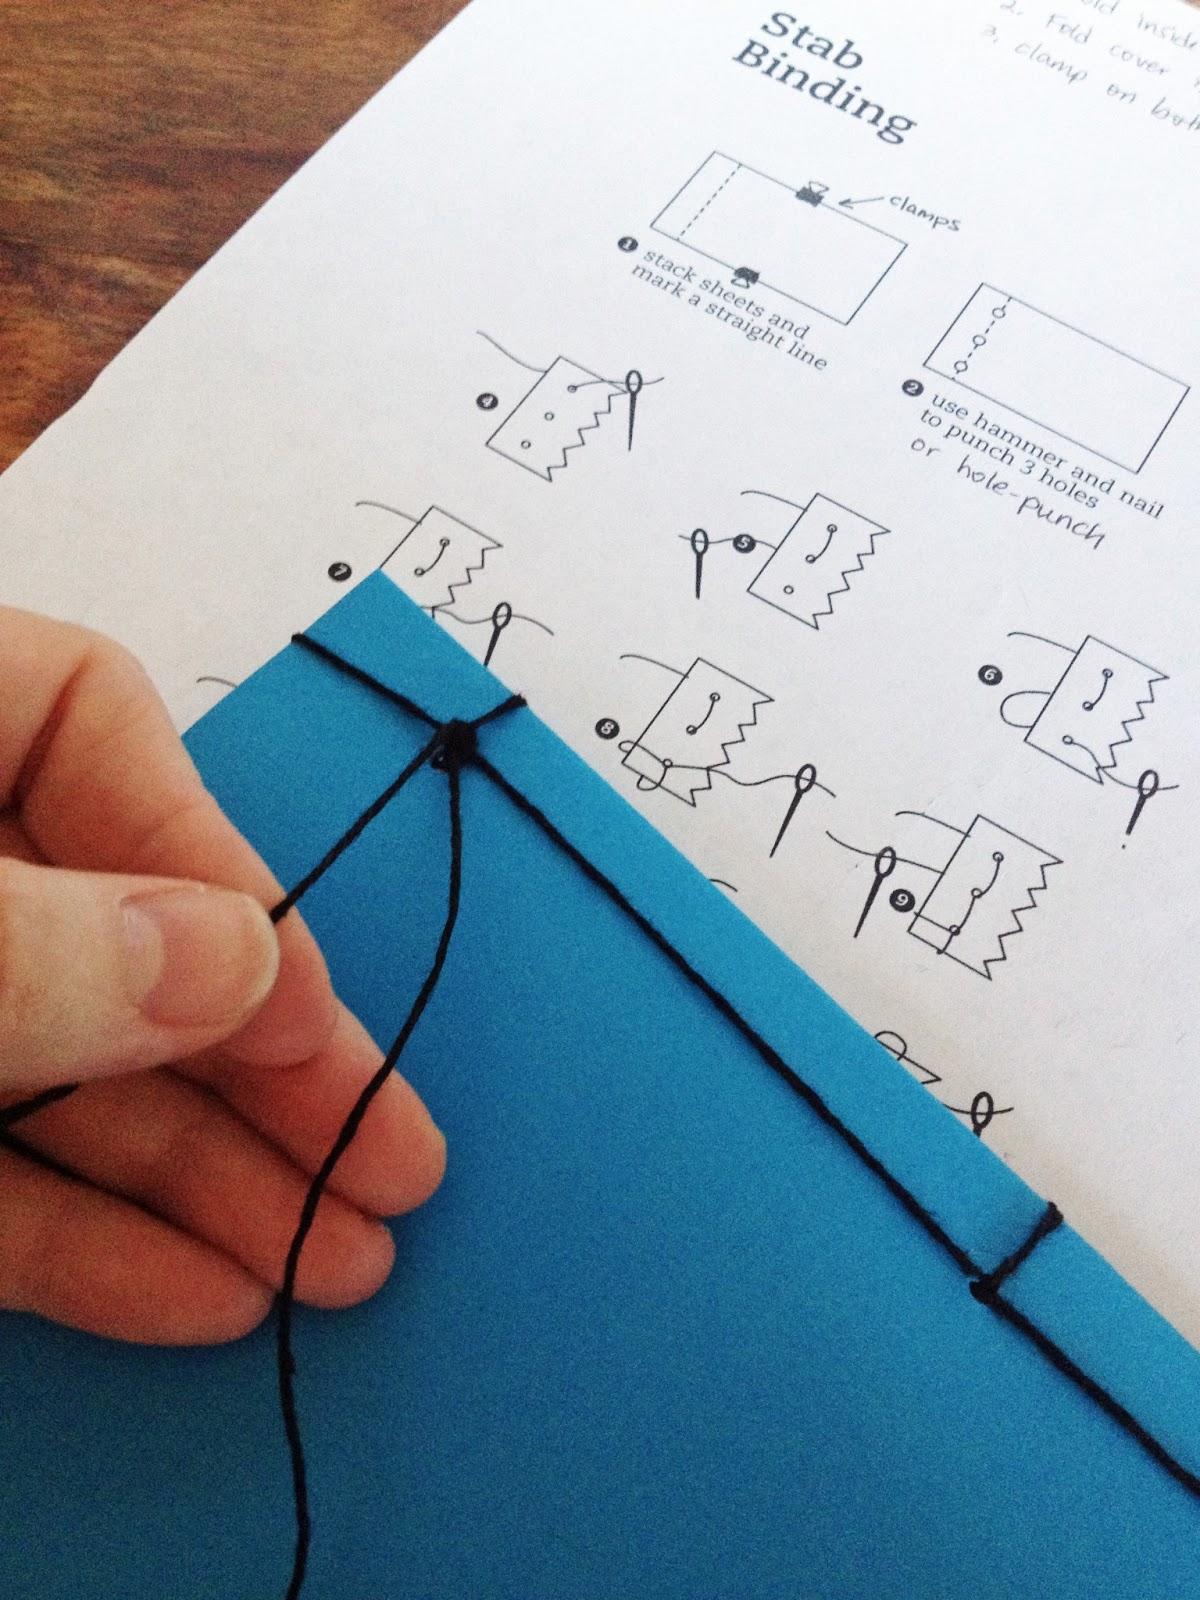 Creative Guide Through The 12 Steps